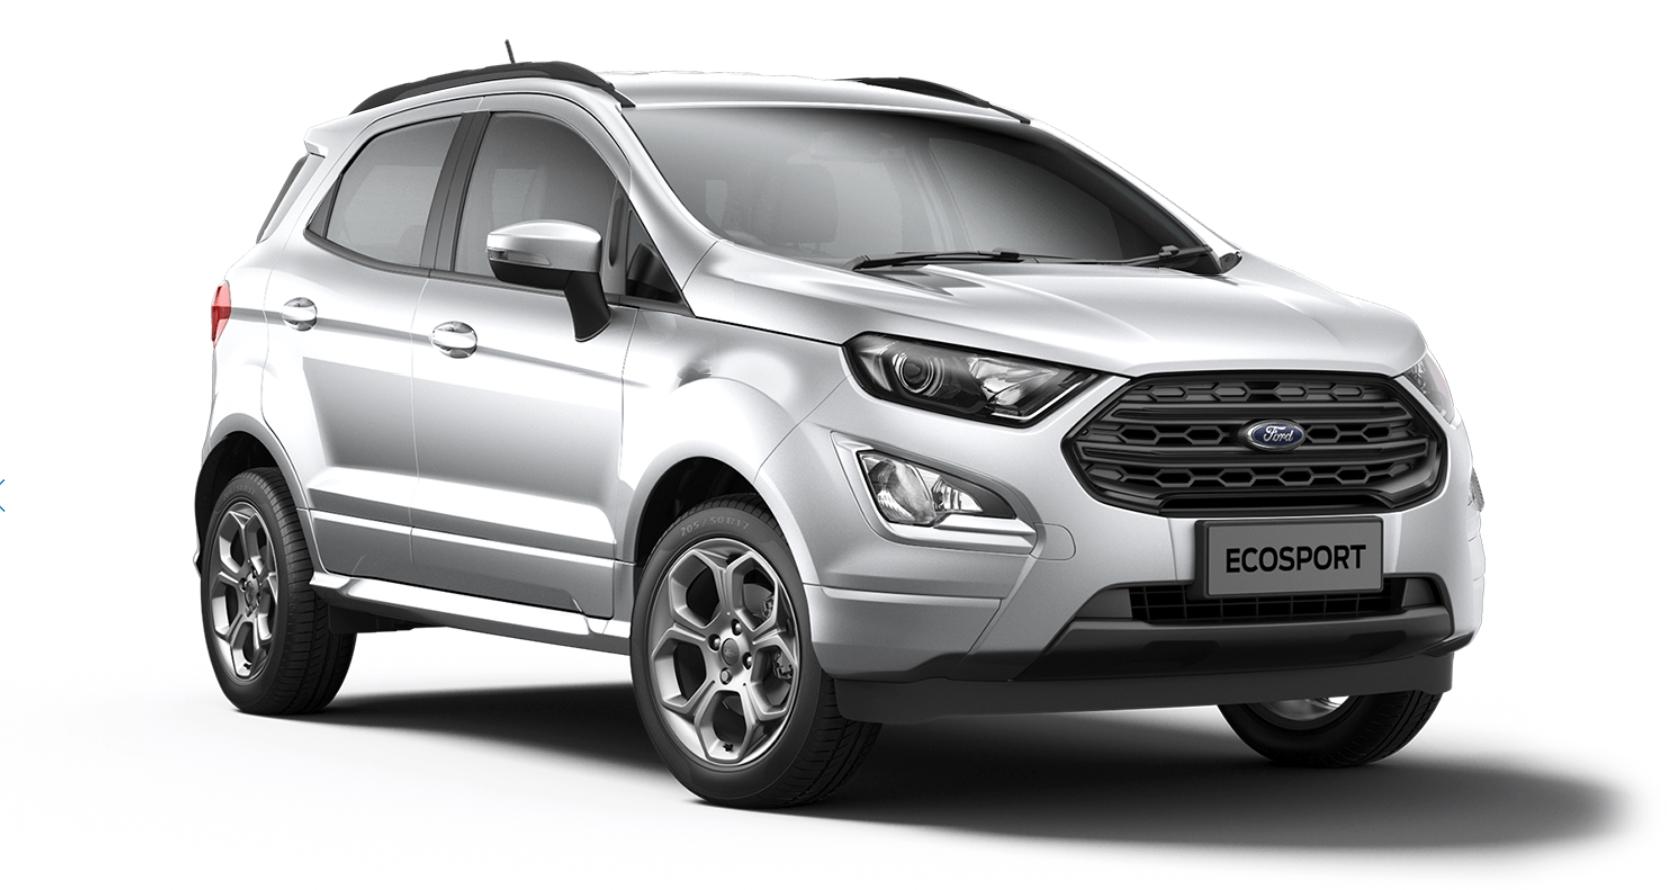 Ford EcoSport 1.0 EcoBoost 140PS ST Line 5dr